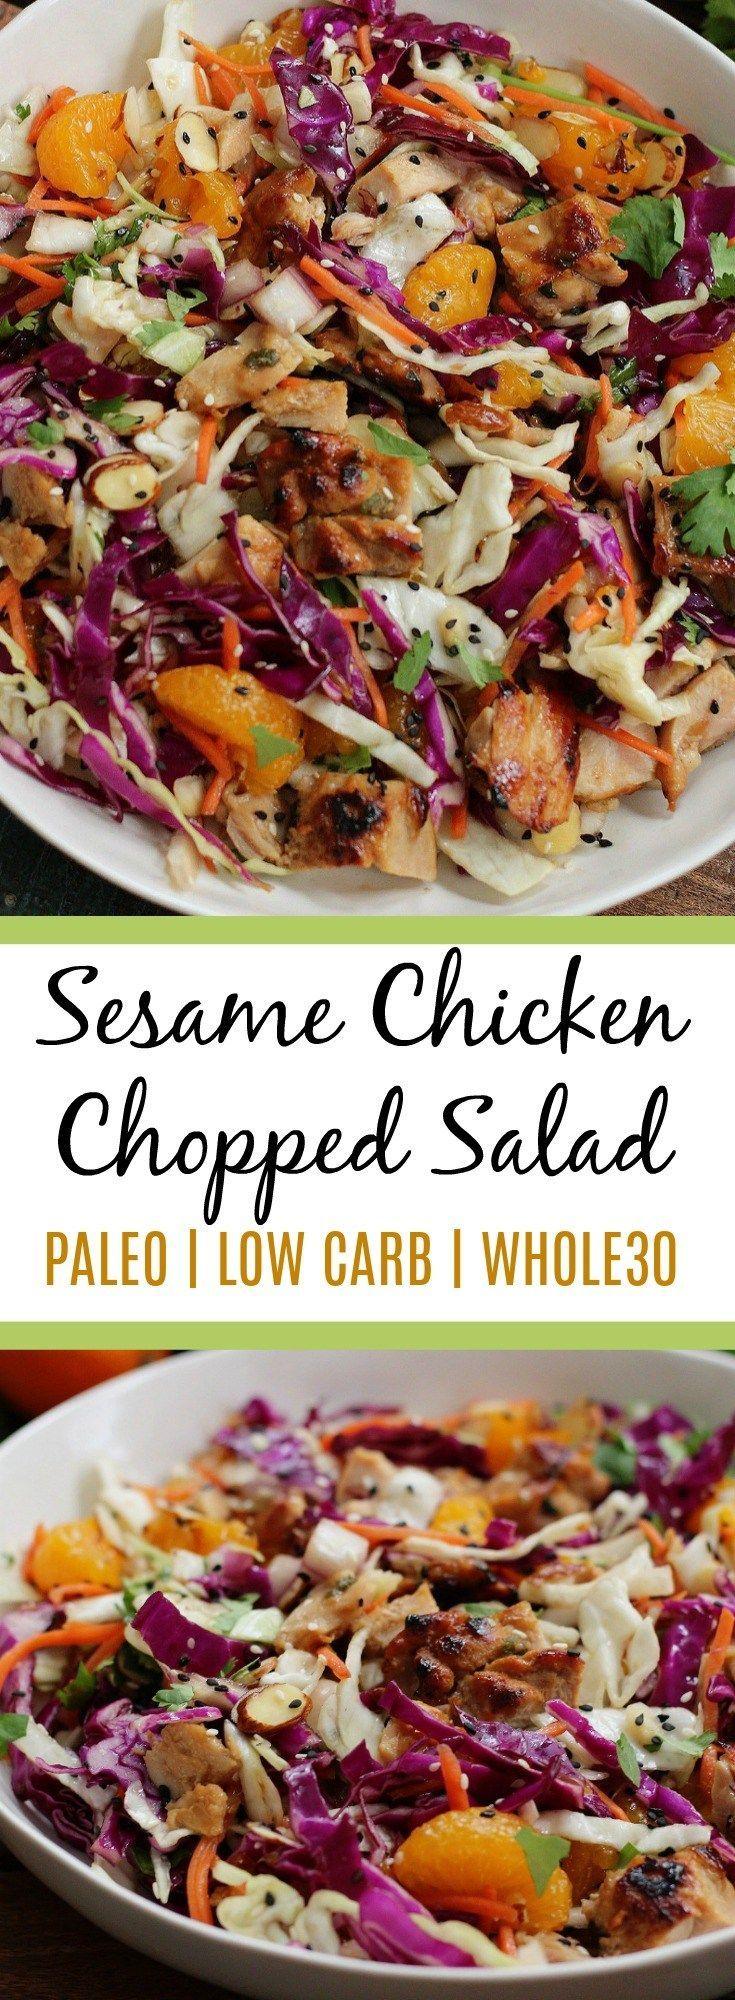 Healthy Sesame Chicken Chopped Salad Paleo Amp Whole30 Recipe Paleo Salad Recipes Healthy